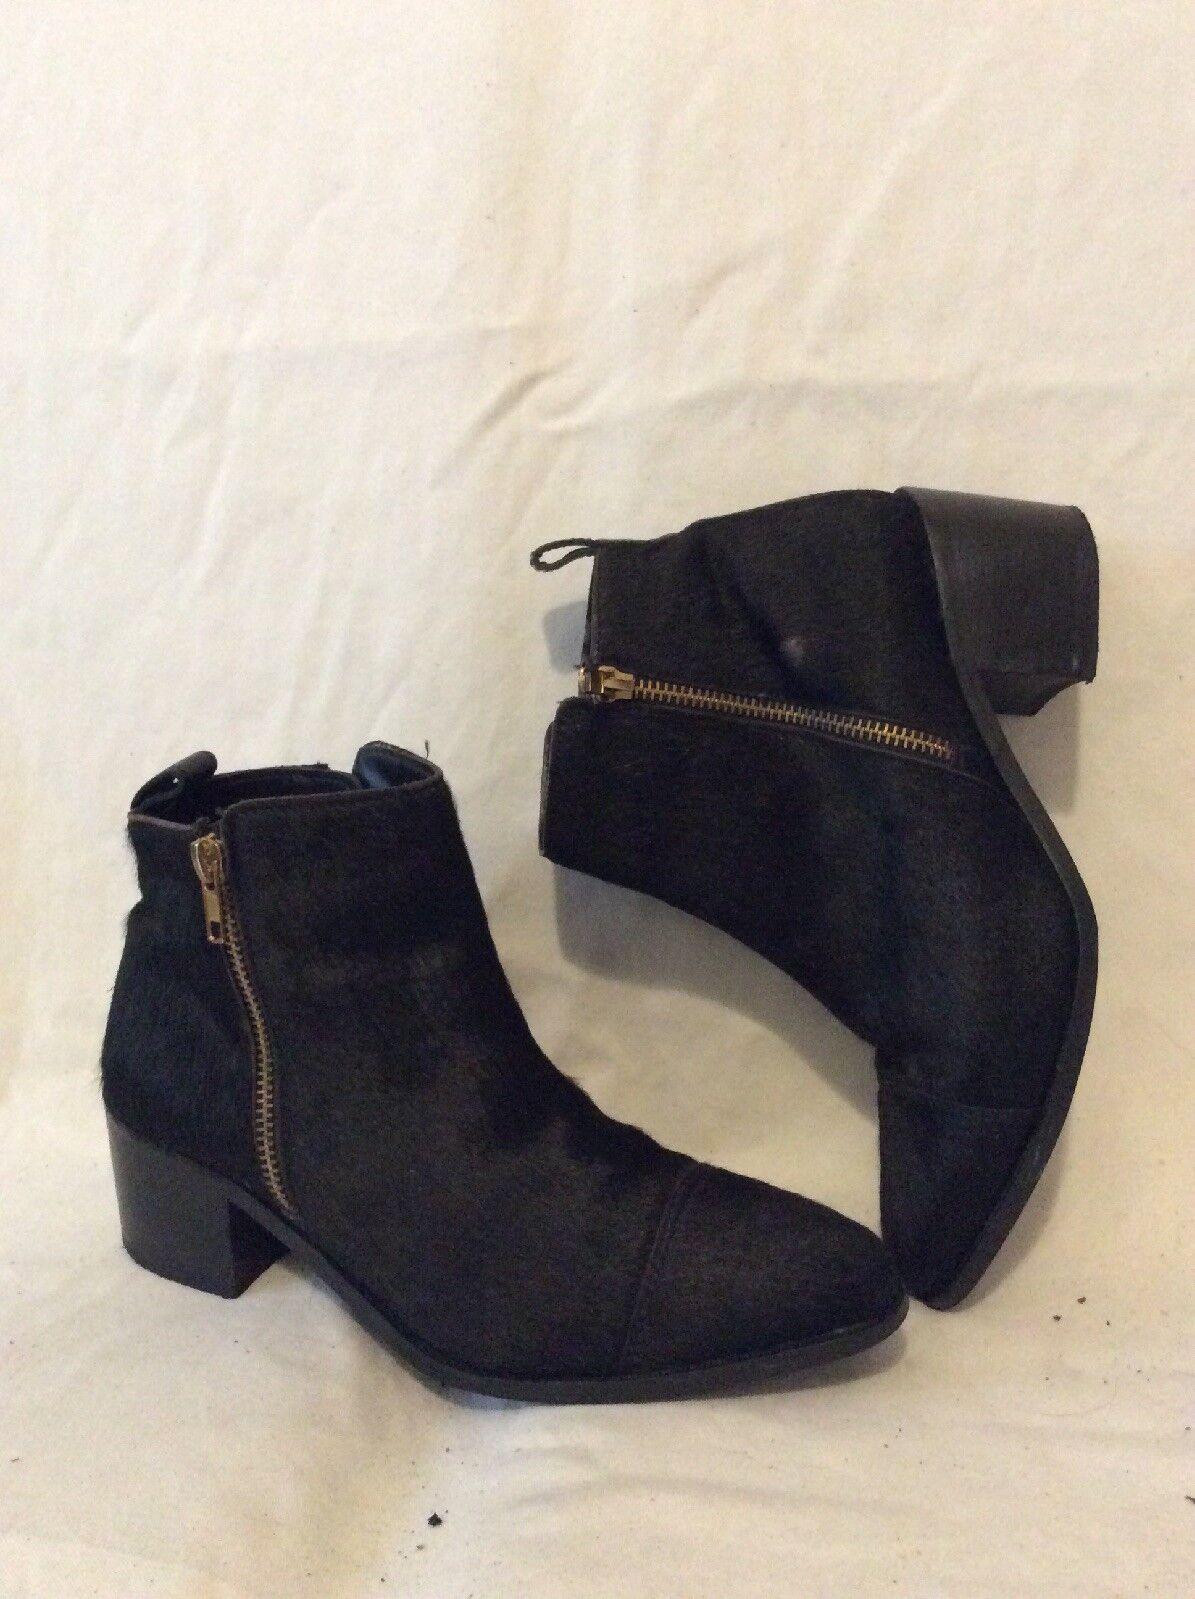 Faith Black Ankle Leather Boots Size 4